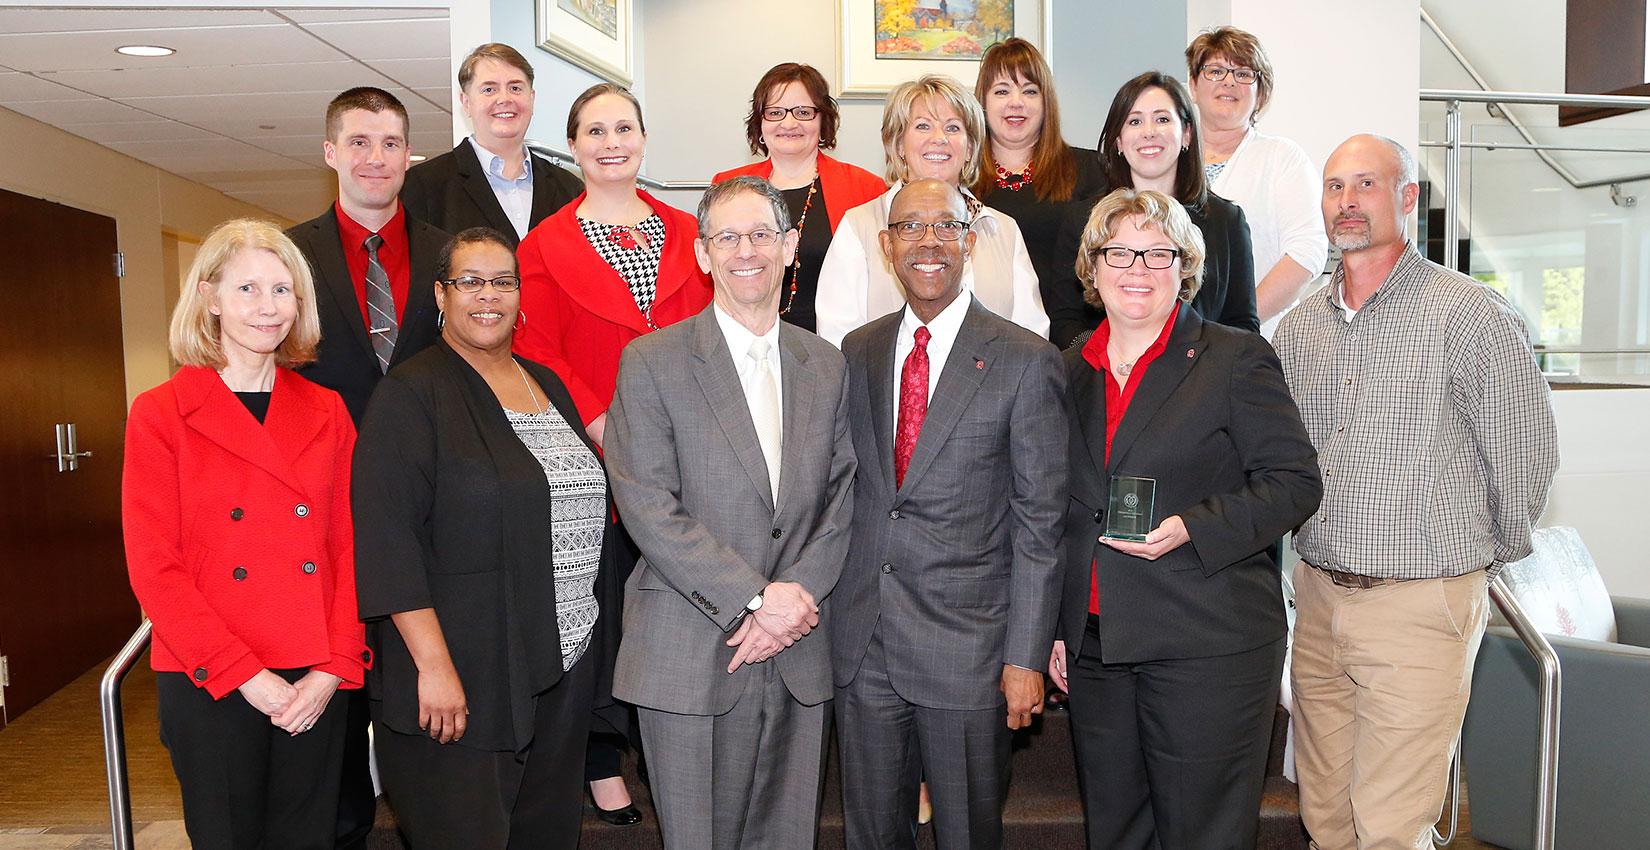 2016 Distinguished Staff Award winners